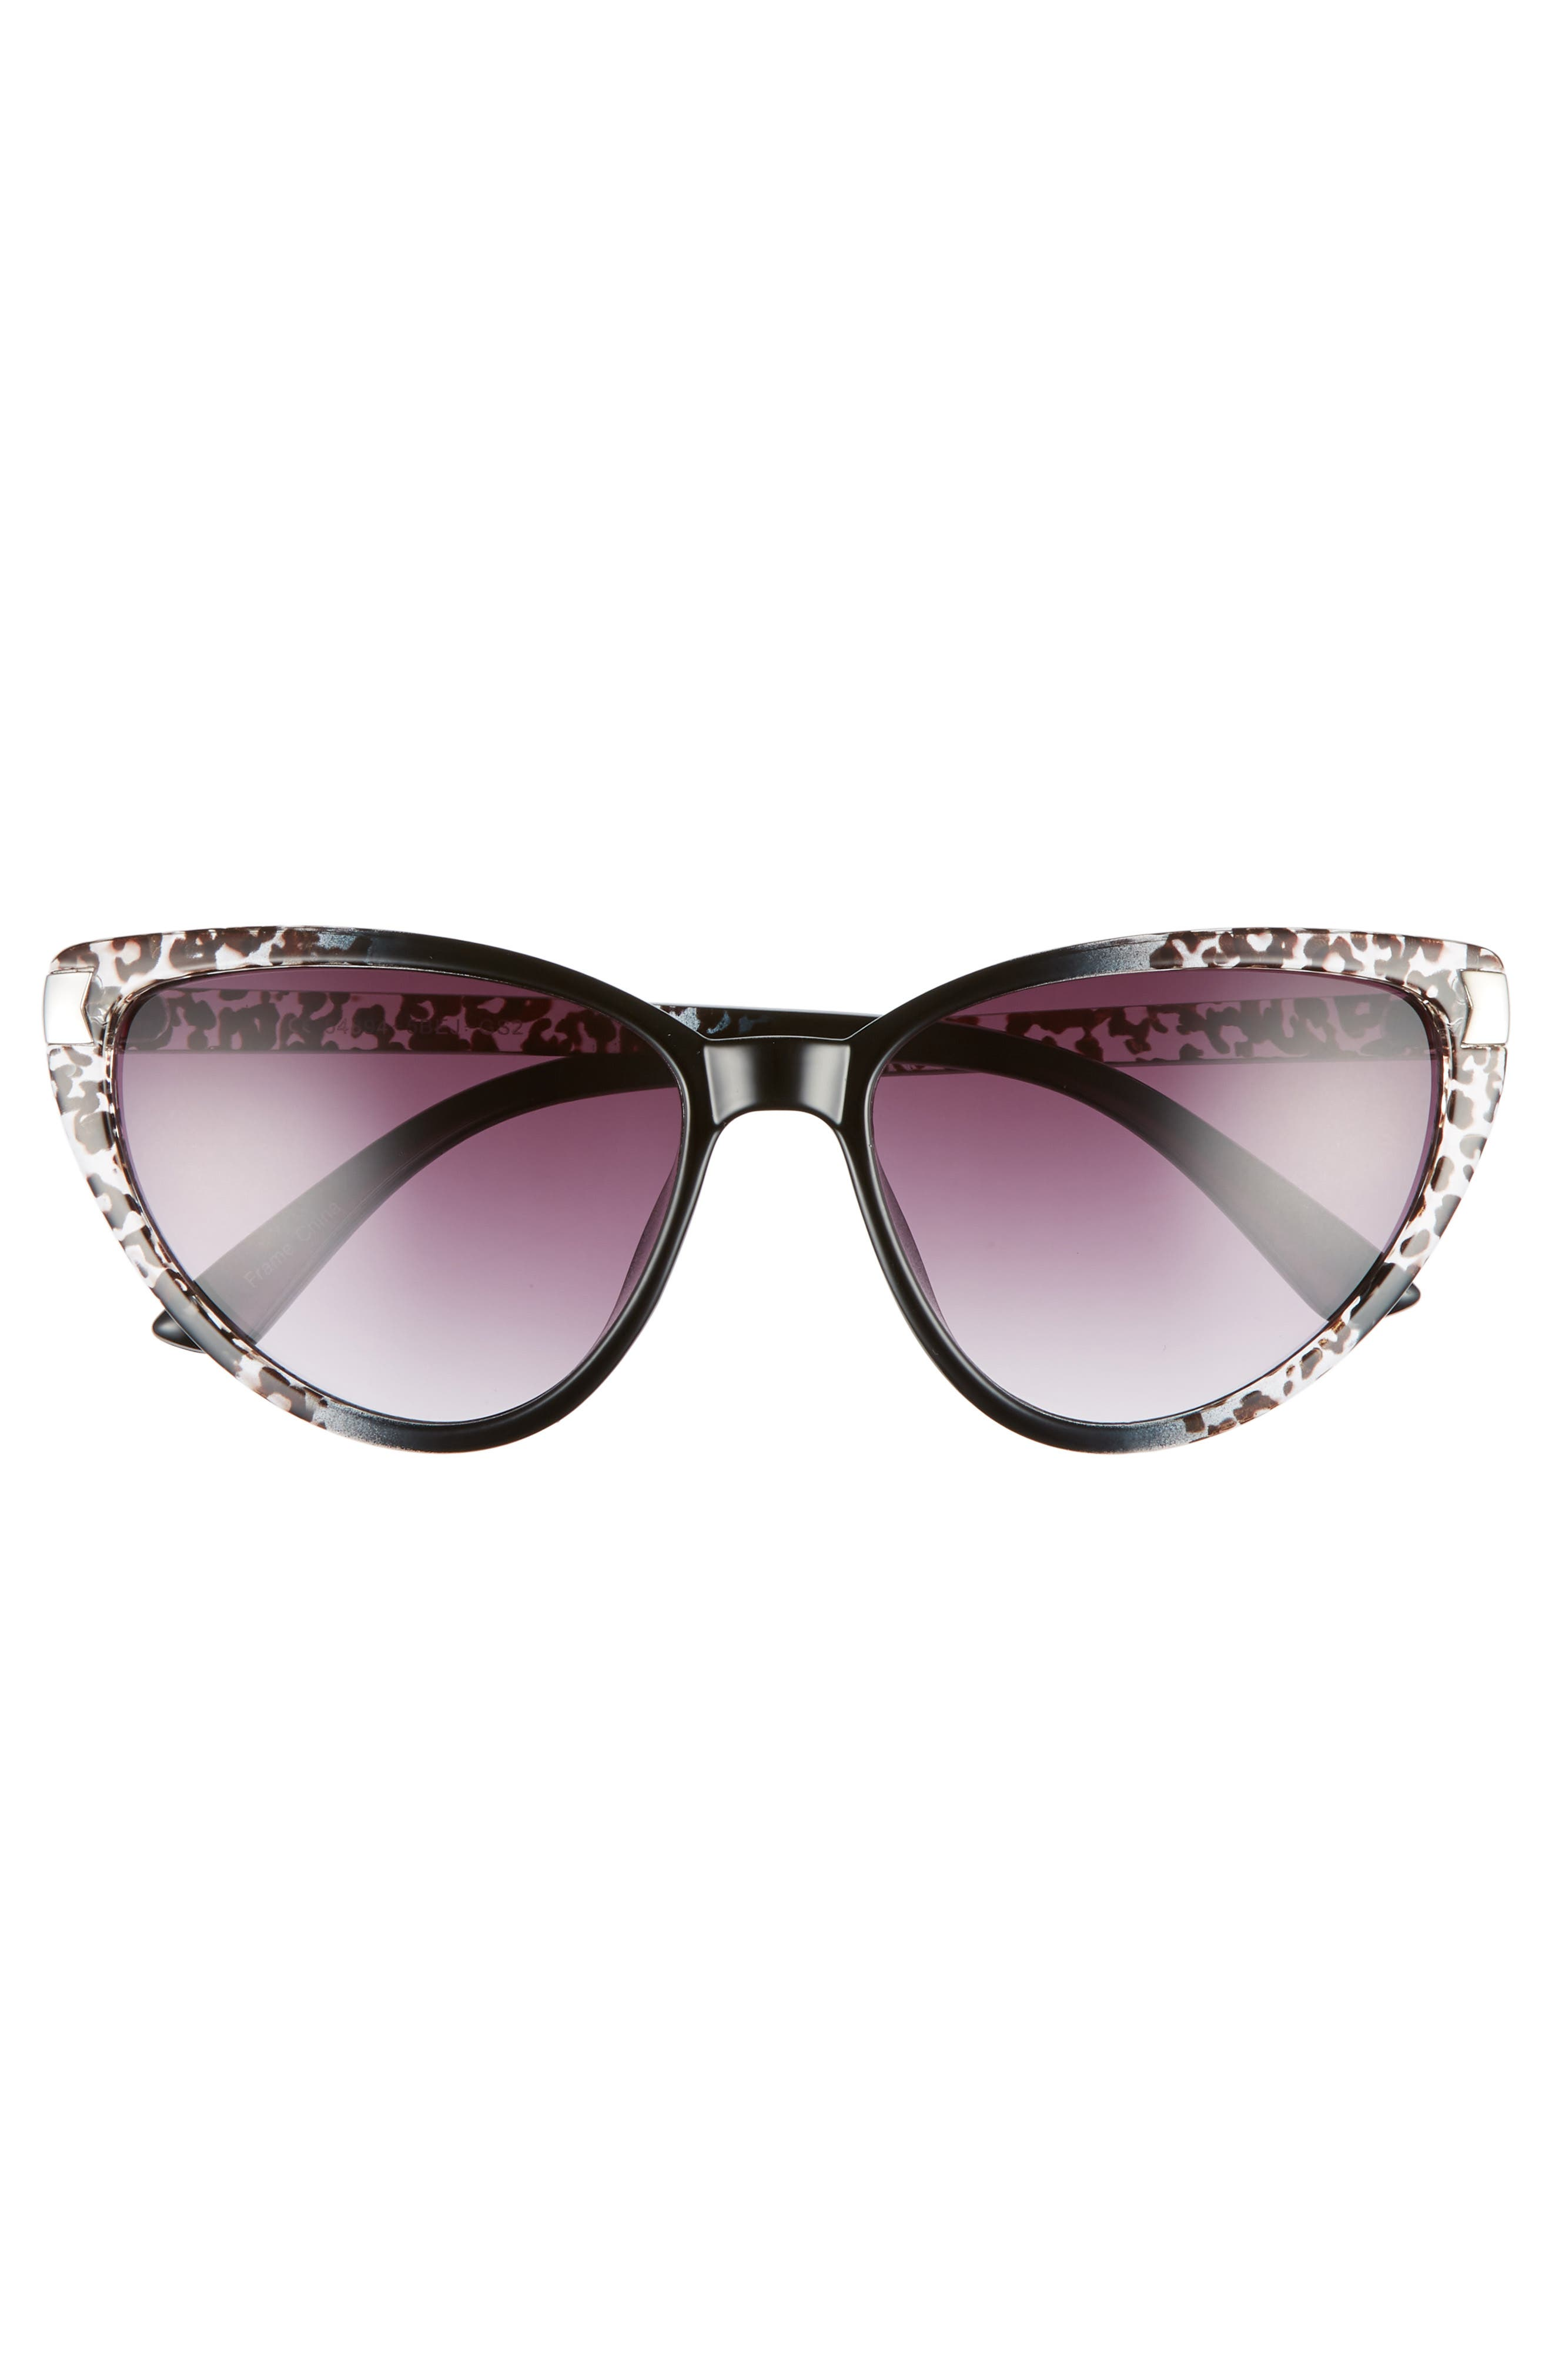 GLANCE EYEWEAR,                             57mm Spotted Cat Eye Sunglasses,                             Alternate thumbnail 3, color,                             001